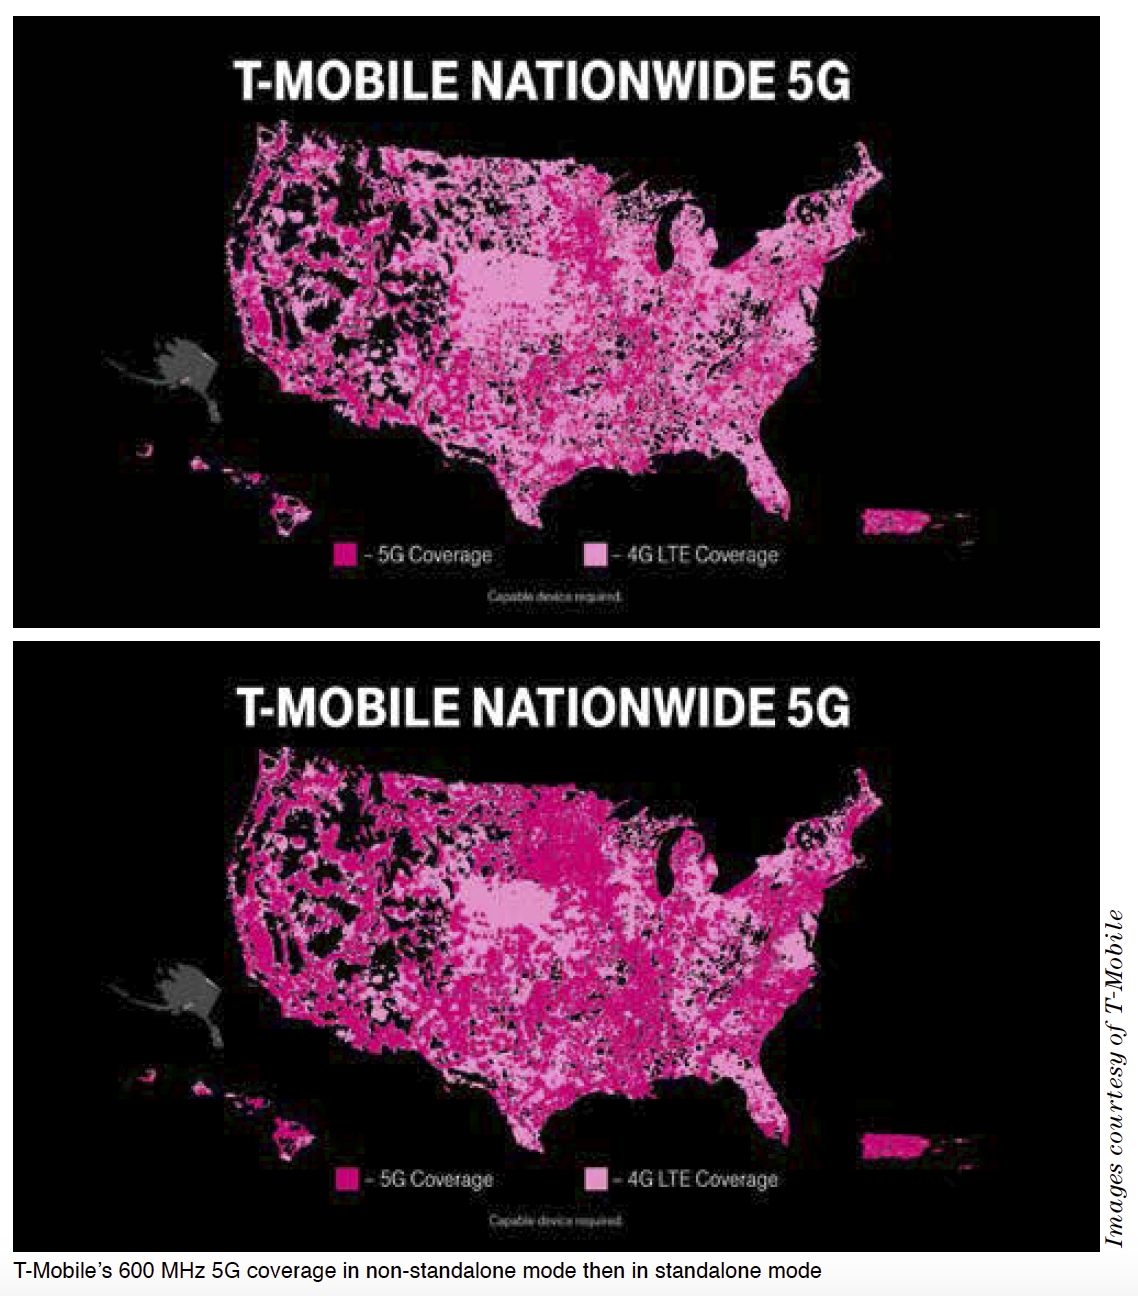 T-Mobile's 600 MHz 5G coverage in non-standalone mode then in standalone mode